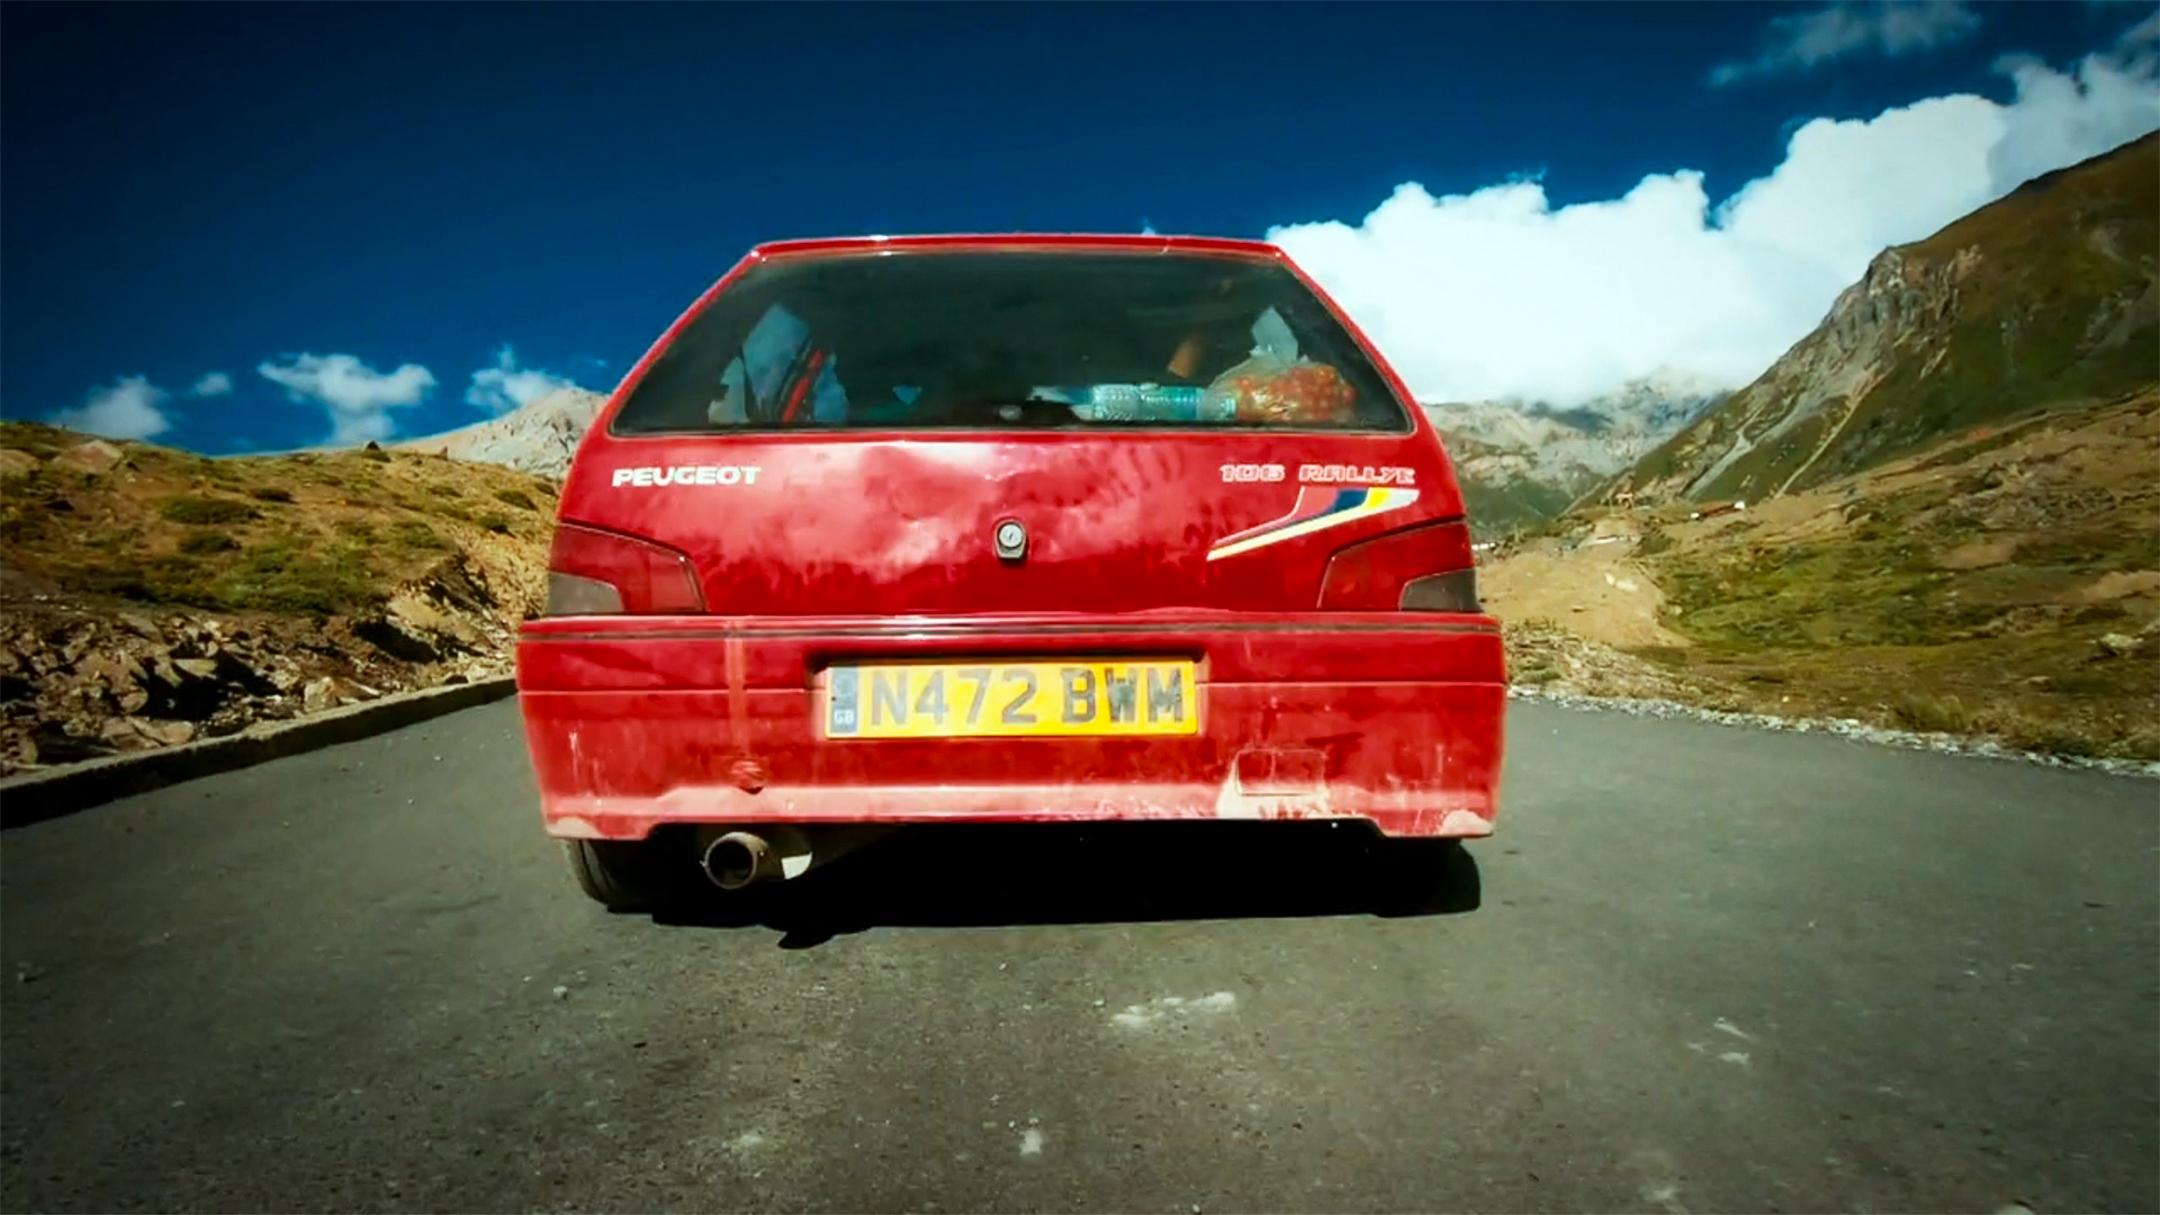 Peugeot_106_World of Top Gear 7